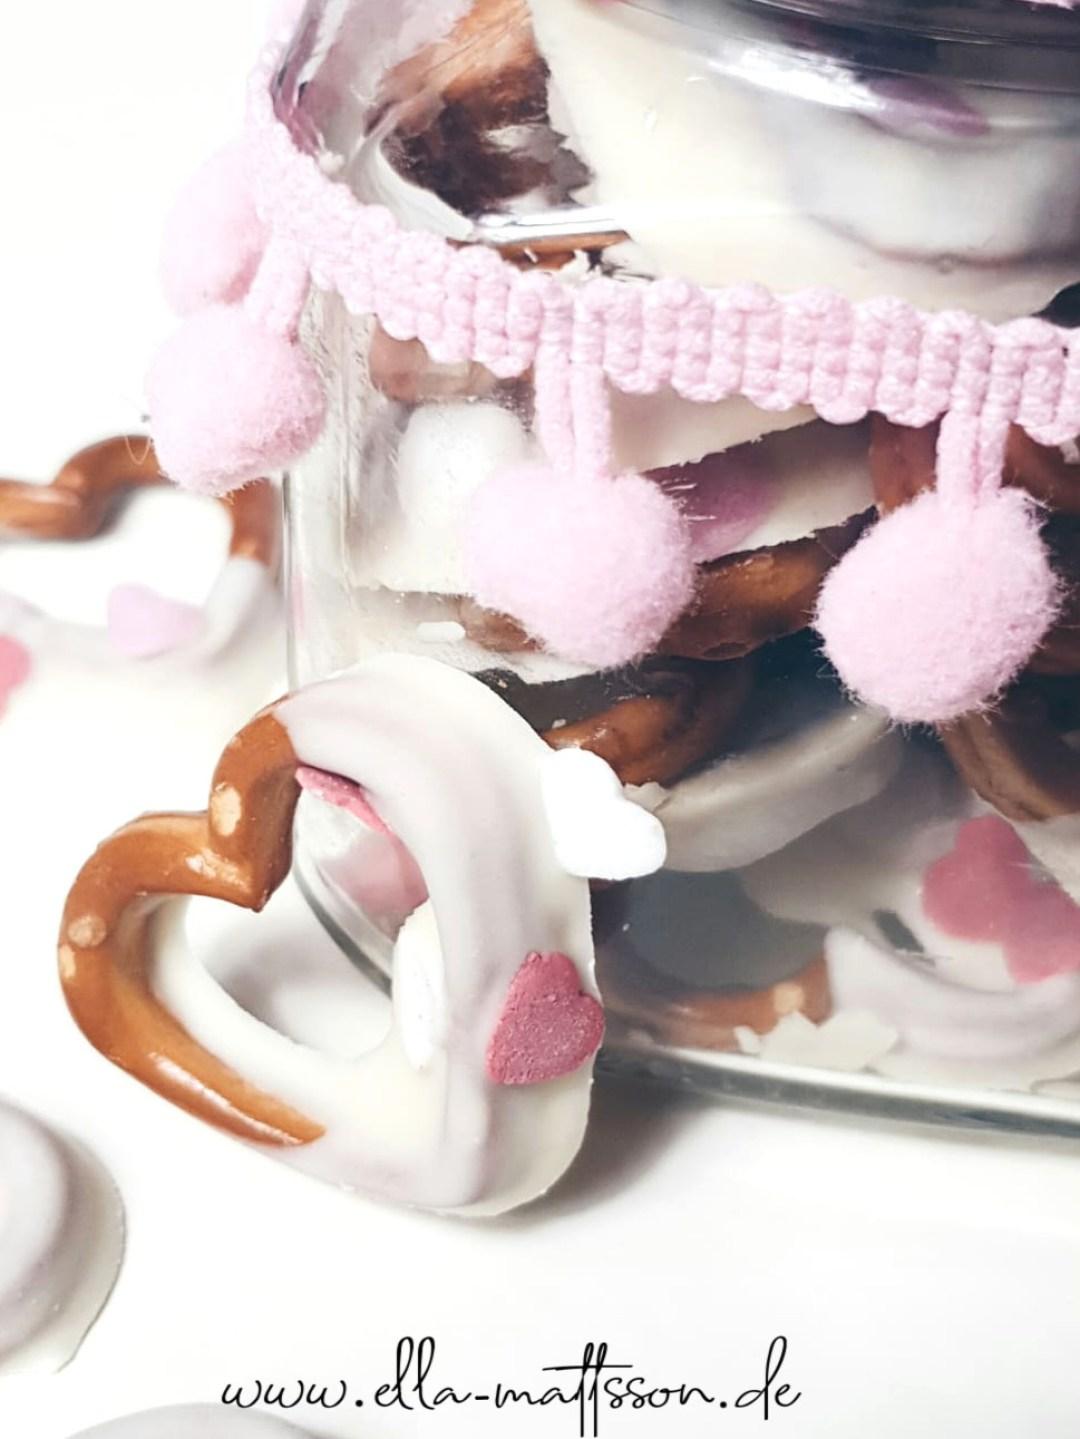 Valentinstag Brezel diy basteln snack rezept geschenkidee selbermache